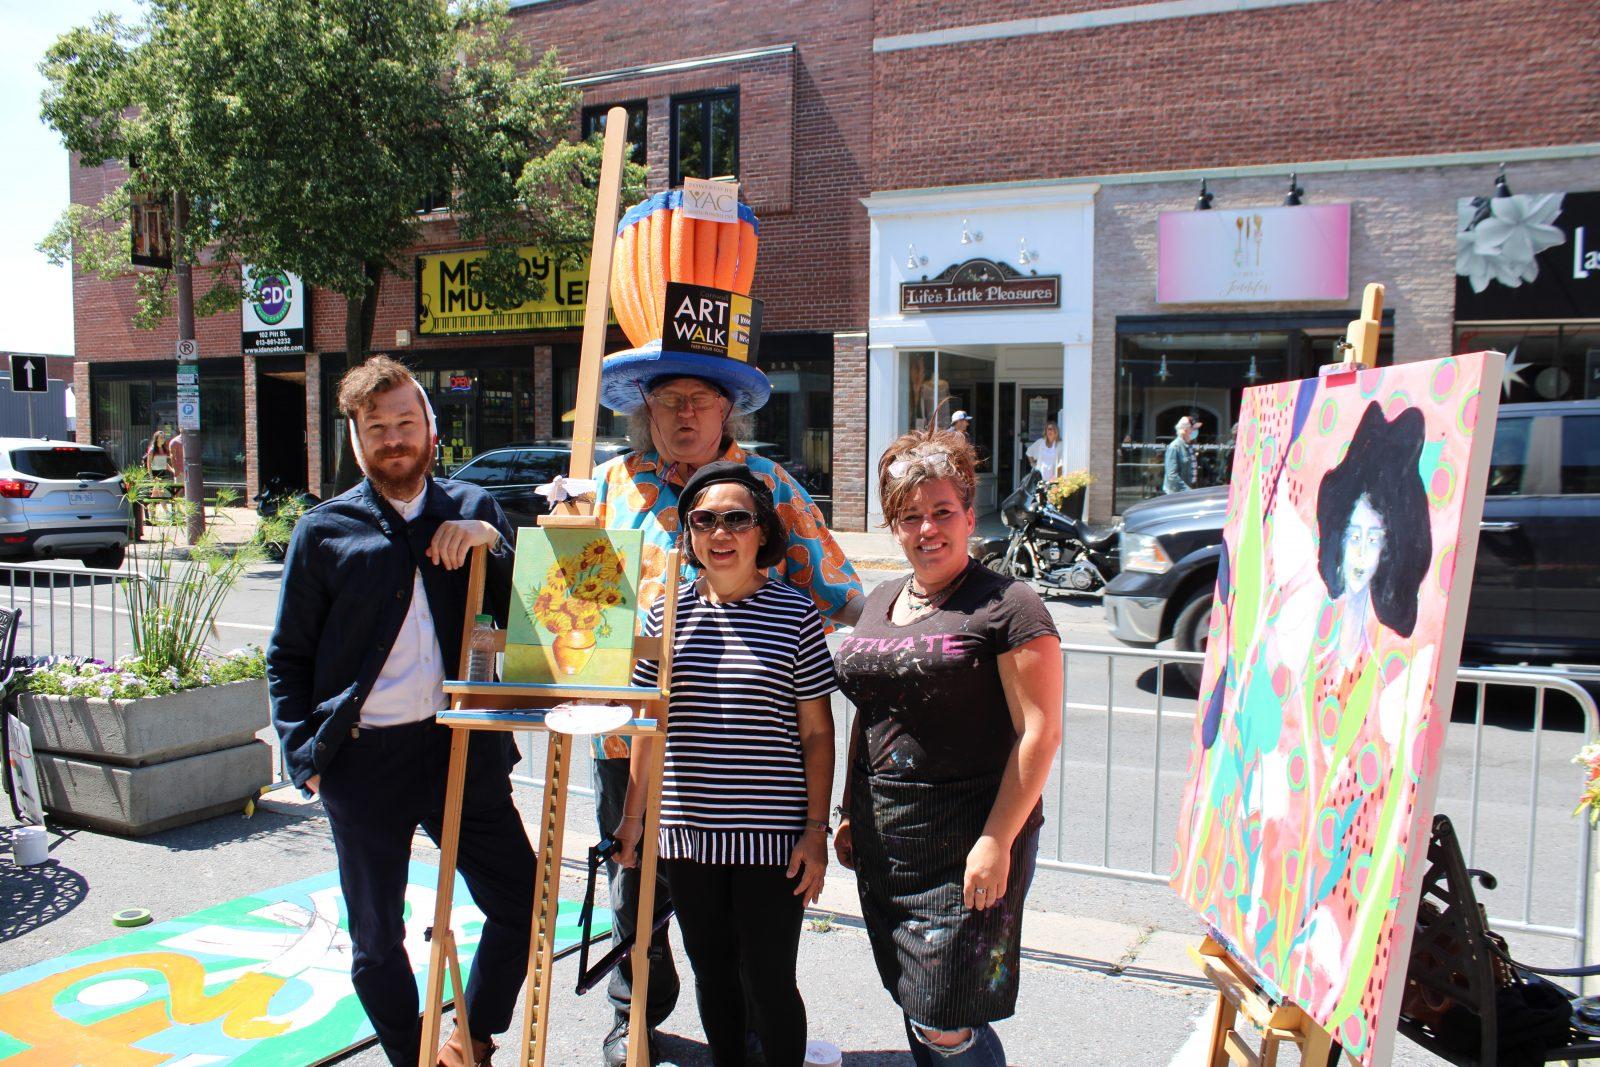 Art-A-Thon raises funds for Cornwall Art Walk